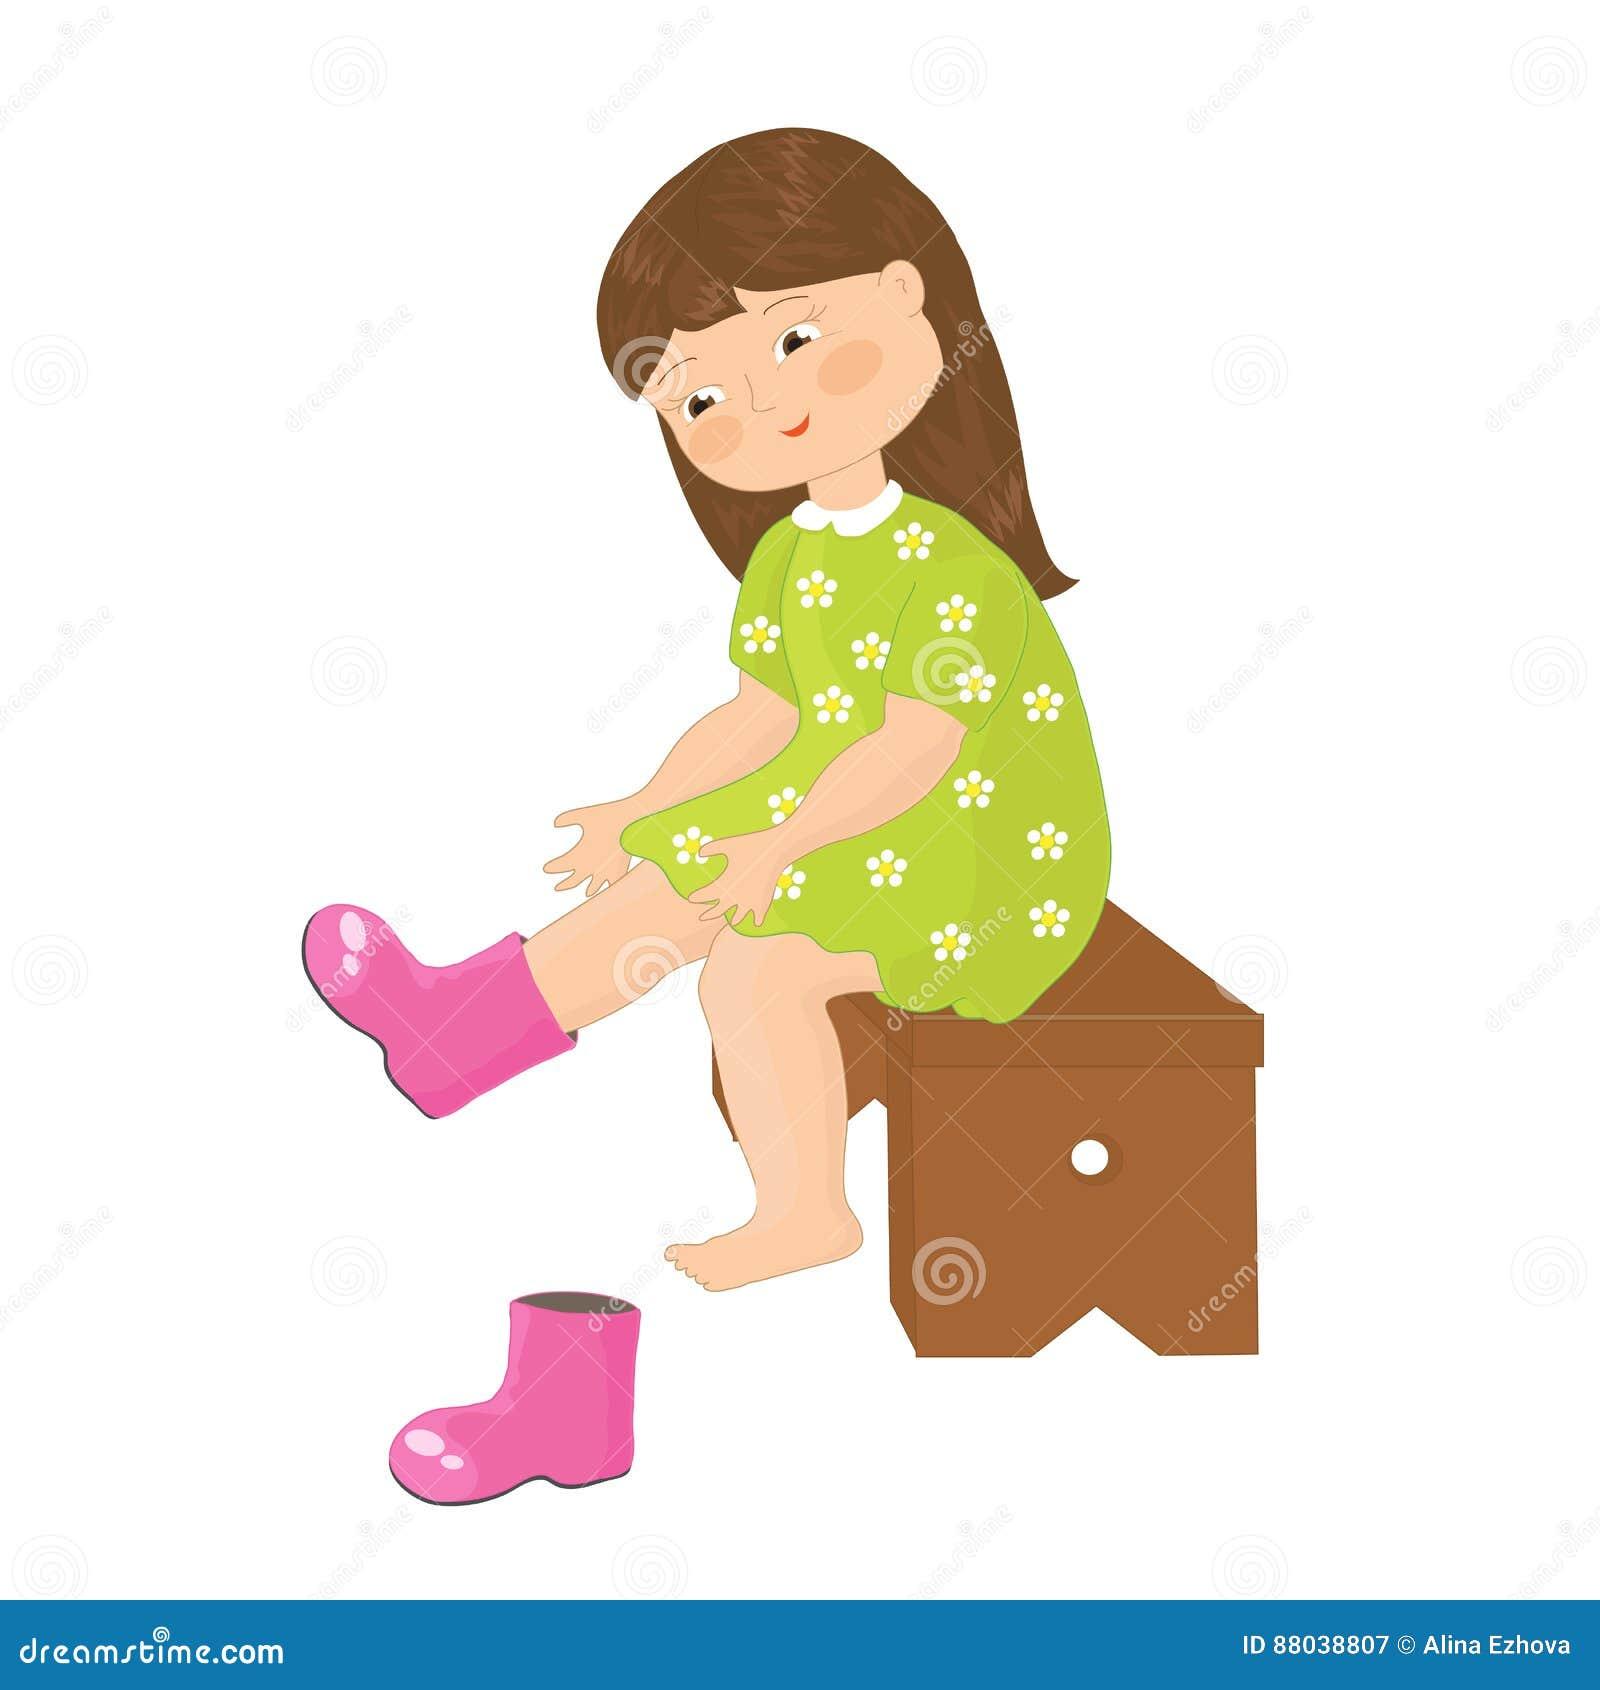 Des Illustration La De Fille Petite Met Bottes Dessus 8nym0ONwv